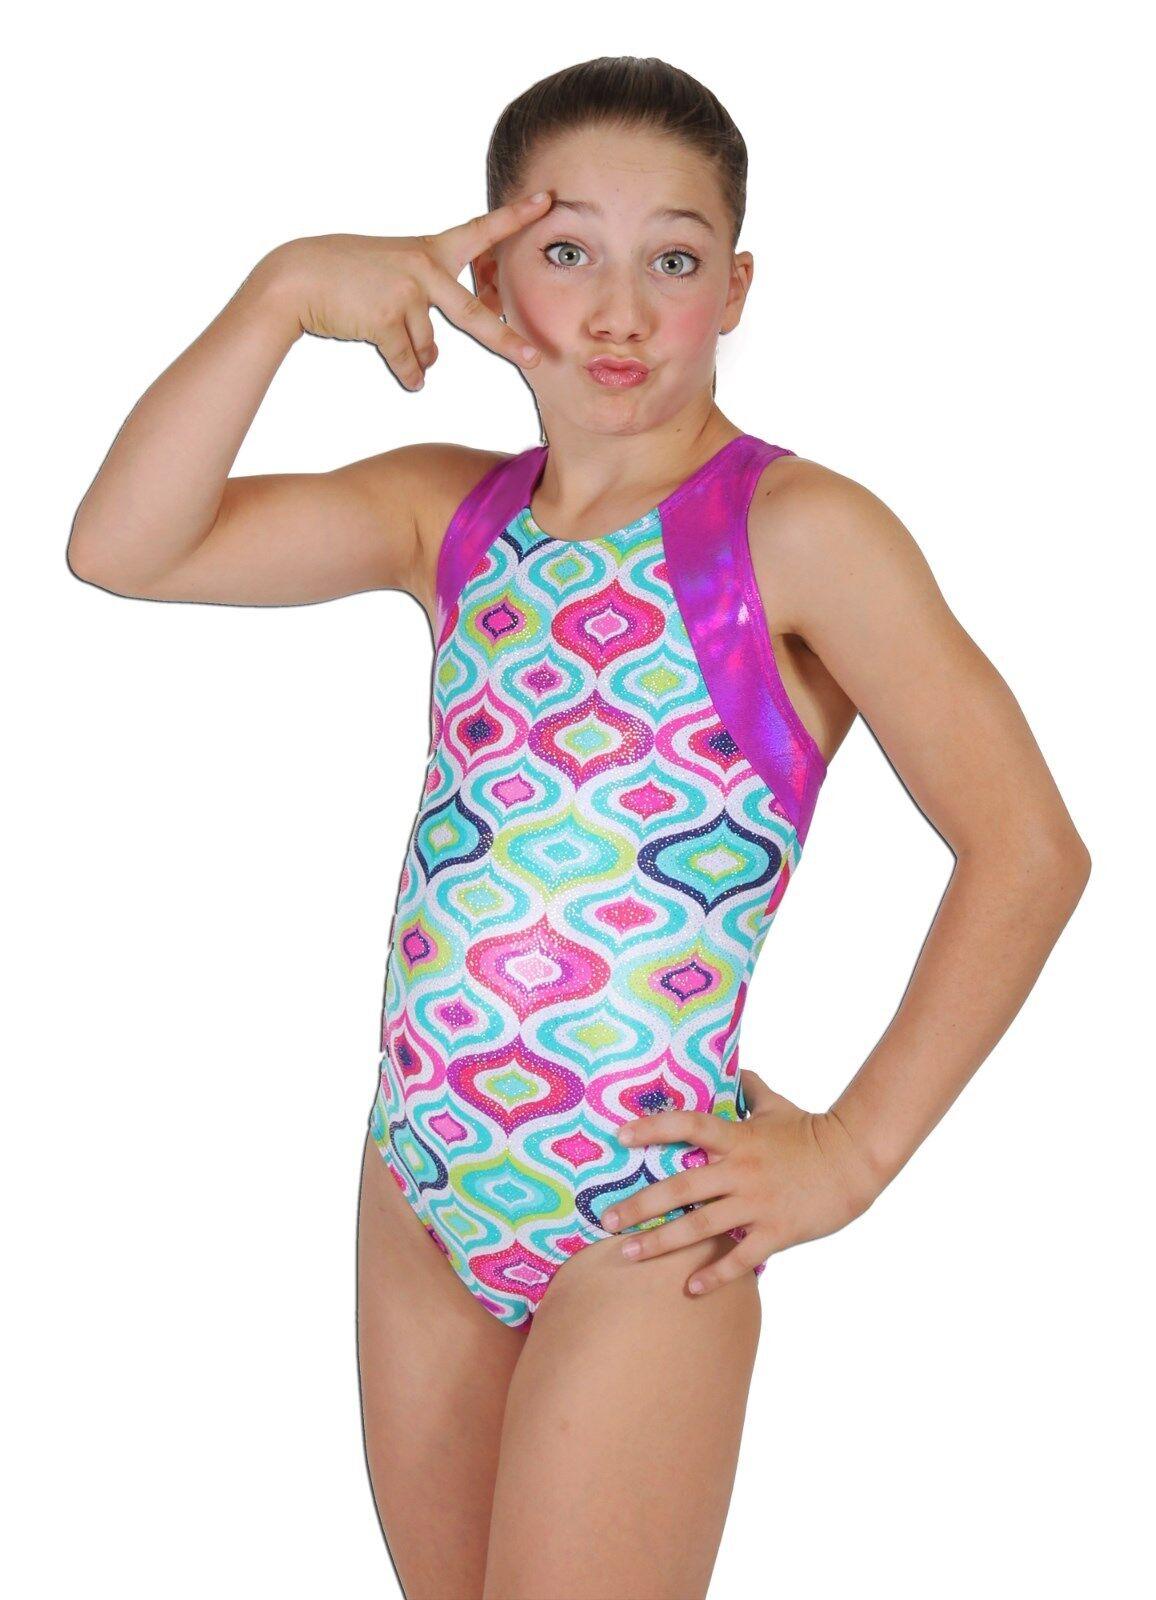 NEW  Jeweled Gymnastics or Dance Leotard by Snowflake Designs